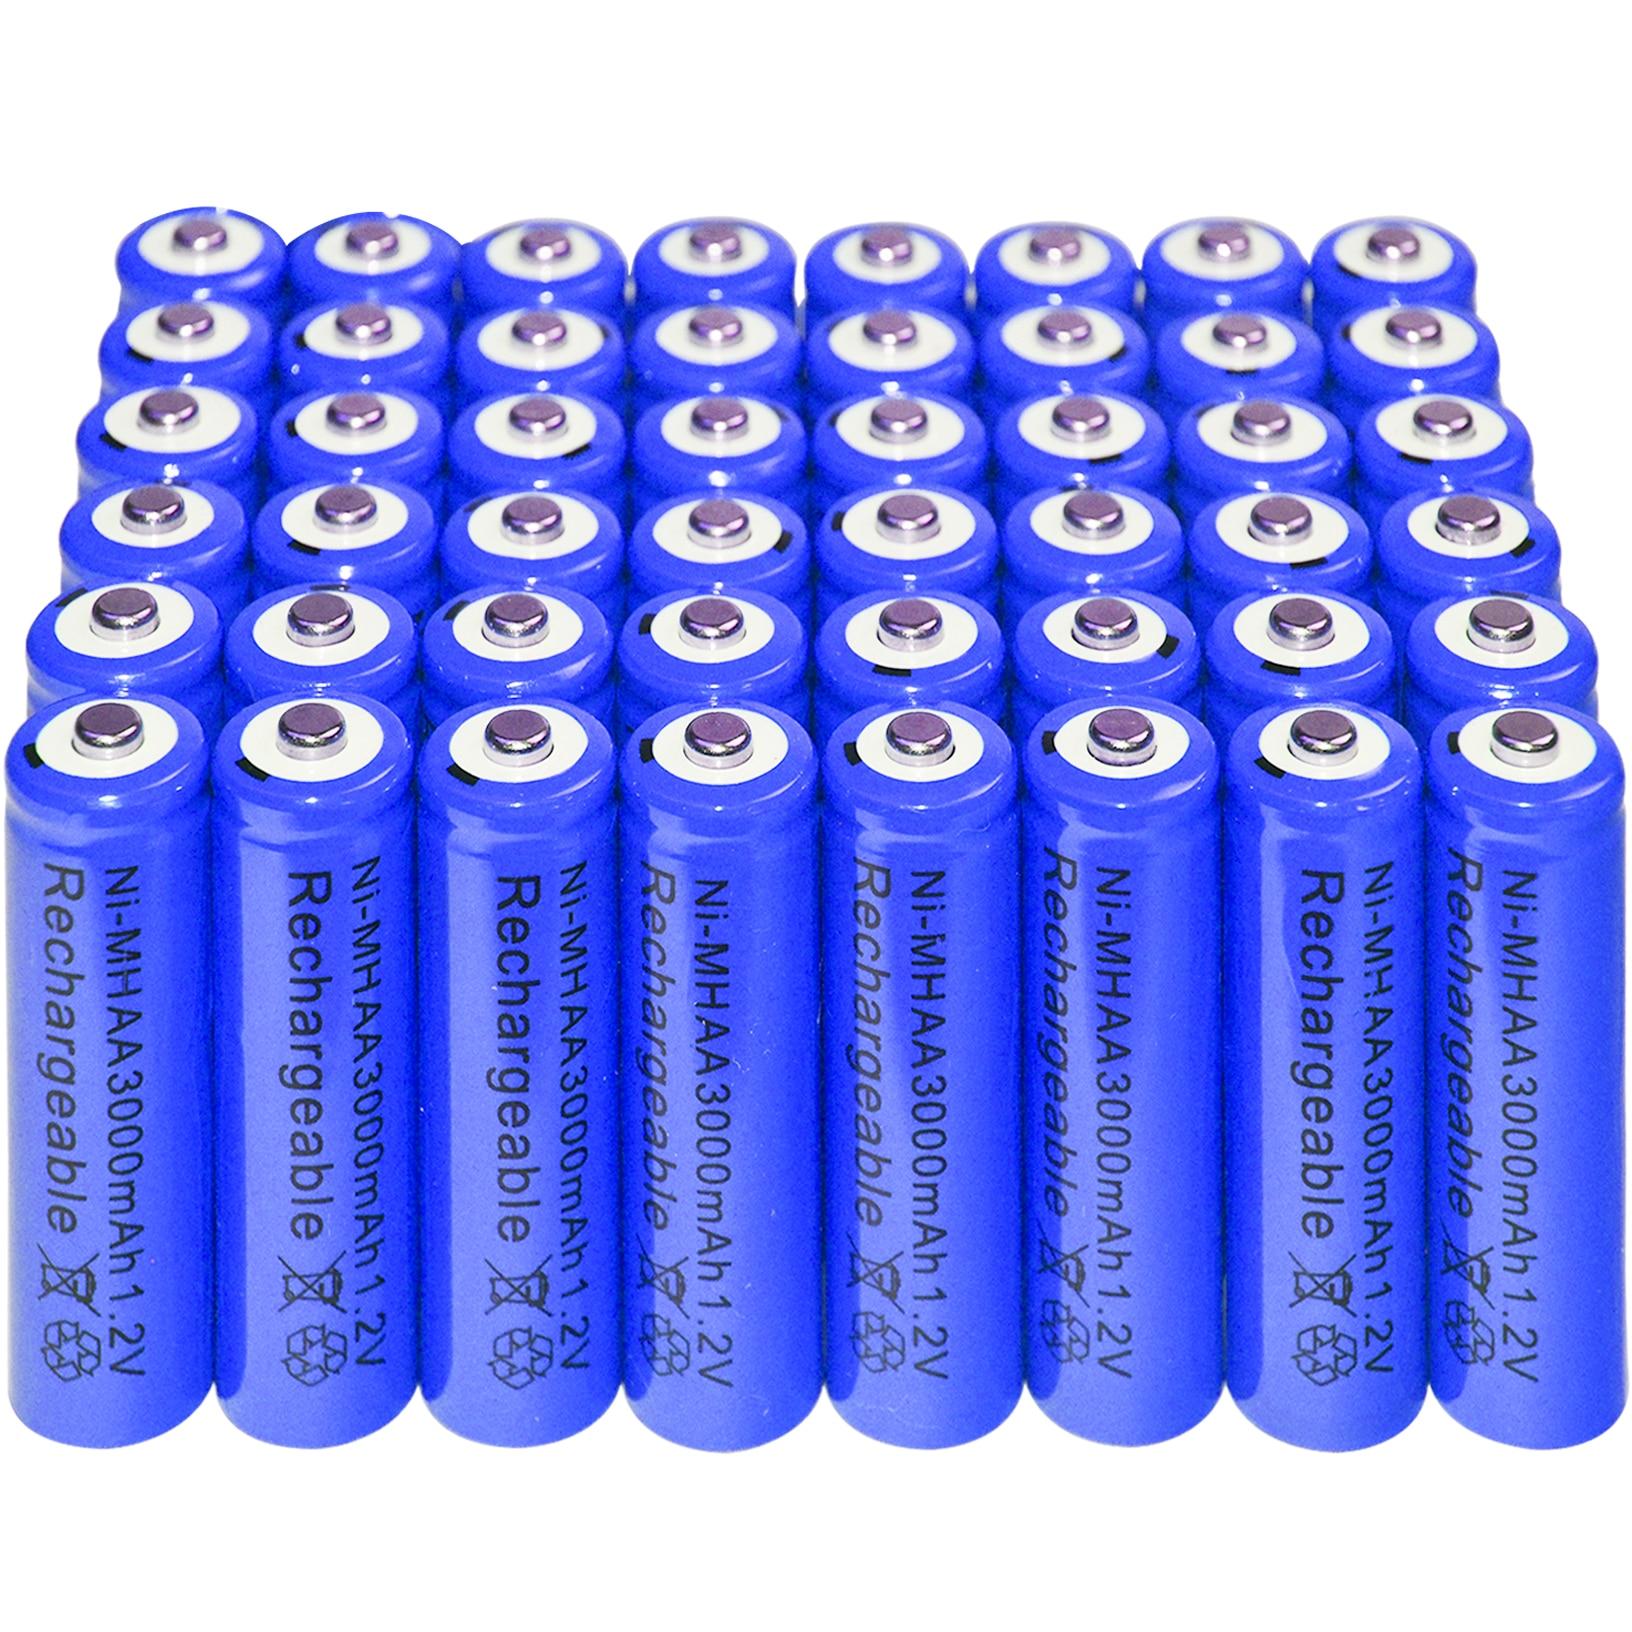 2/8/20/48 шт AA Аккумуляторная батарея Ni-MH 3000mAh 1,2 V Синяя батарея навалом никель-гидрид